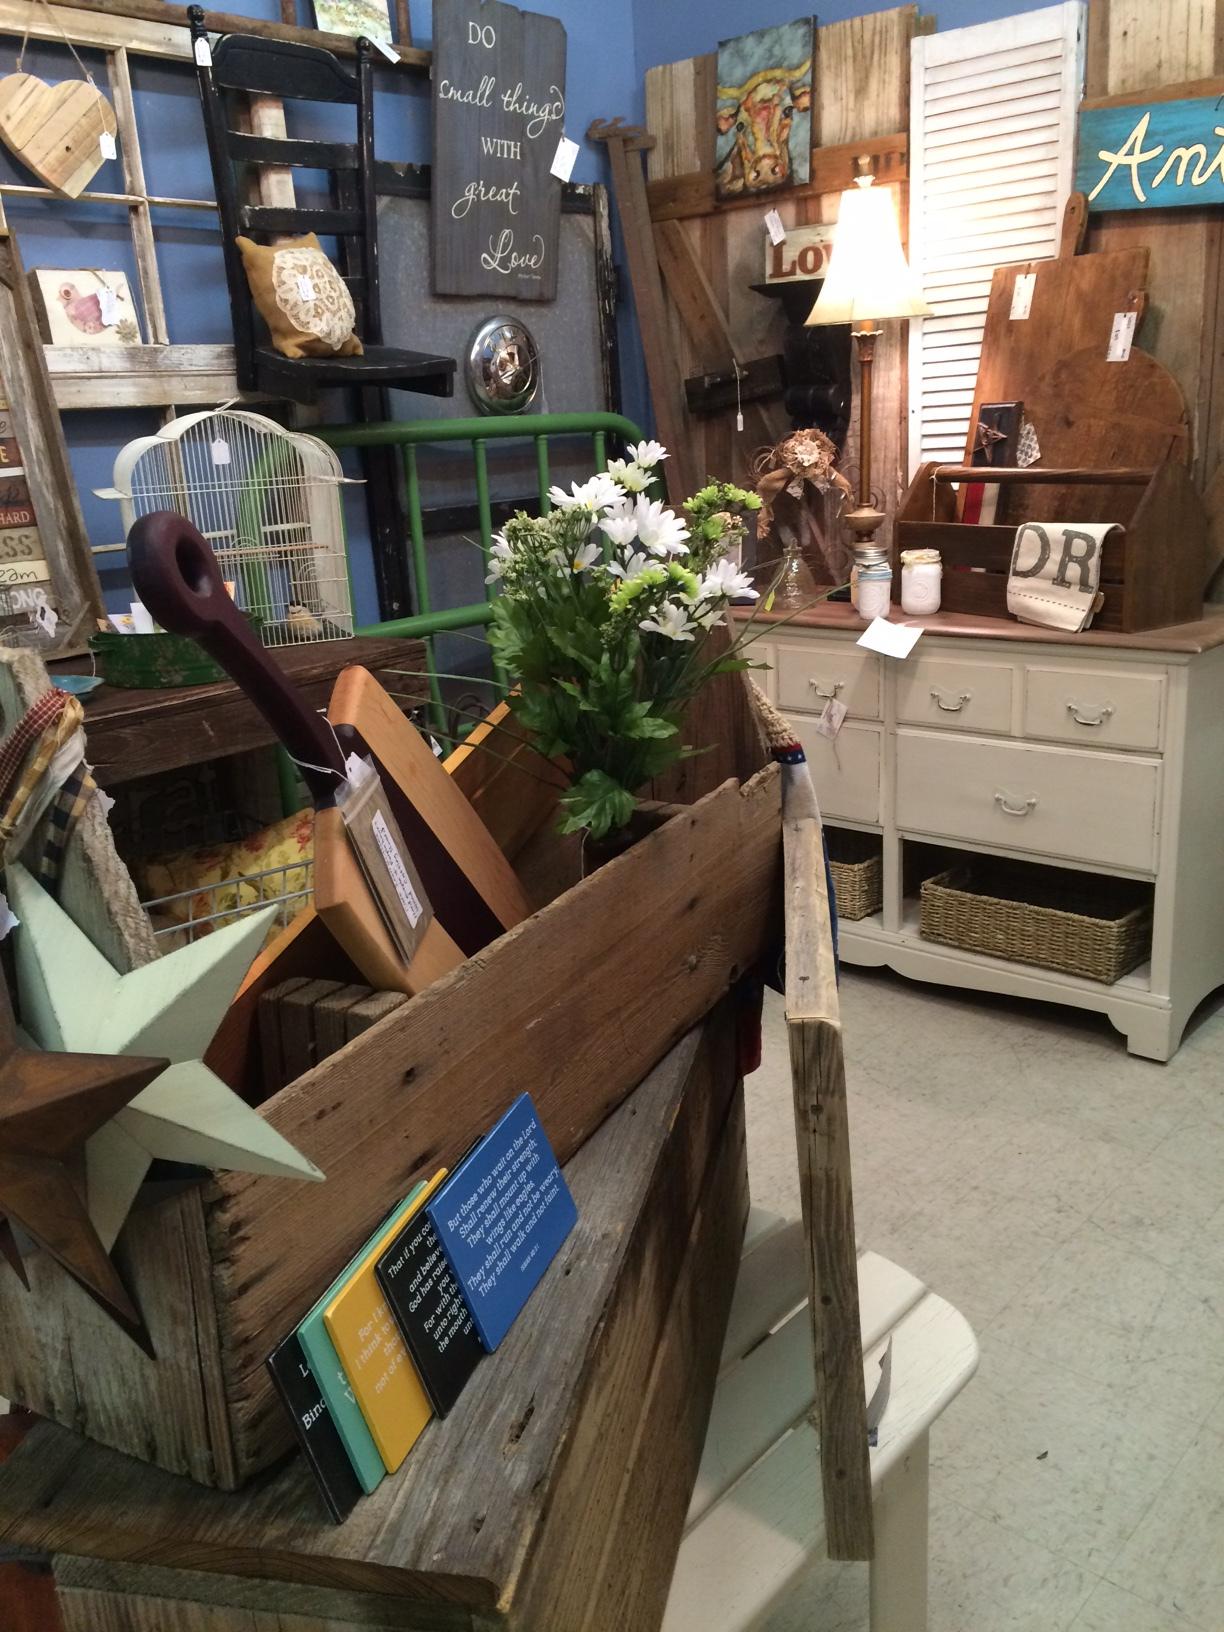 Antique toolbox